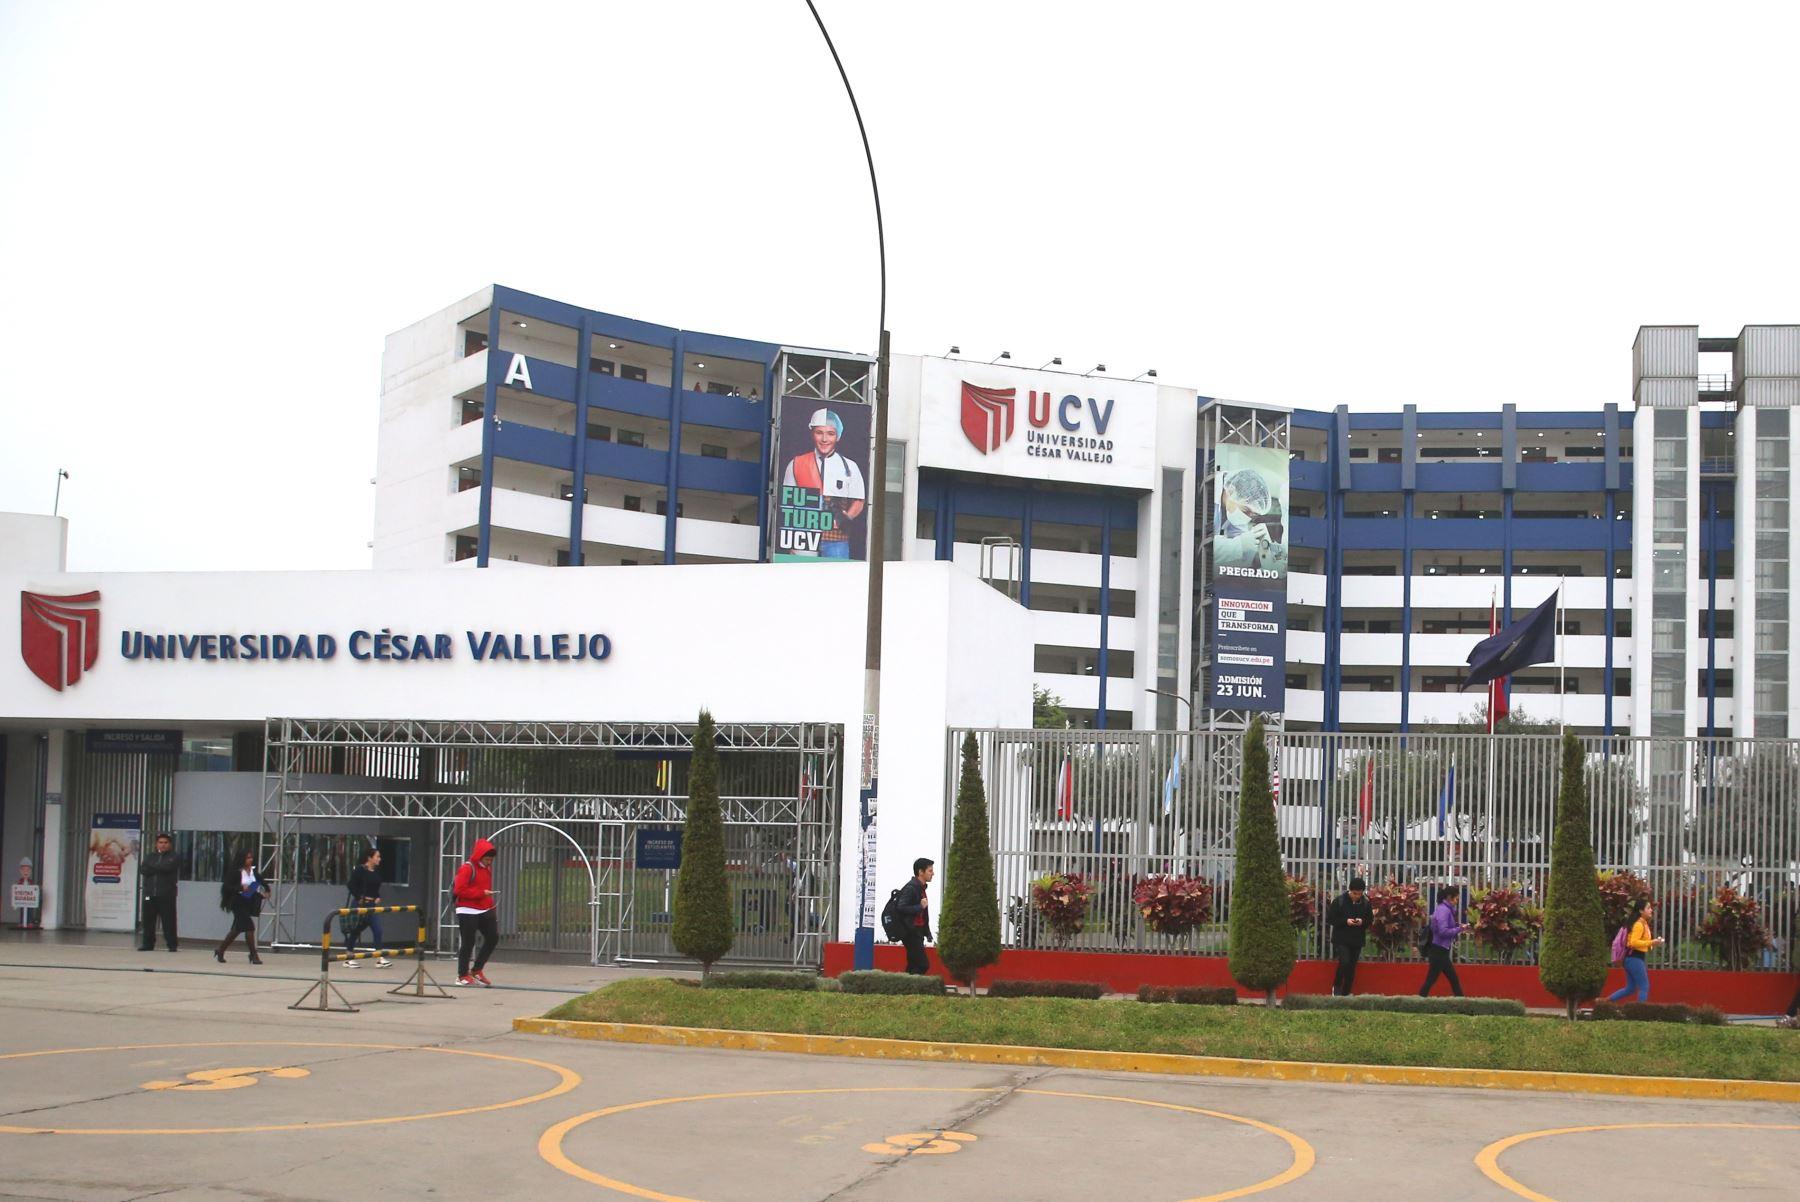 UCV sinceró oferta académica e incrementó docentes calificados. Foto: ANDINA/Vidal Tarqui